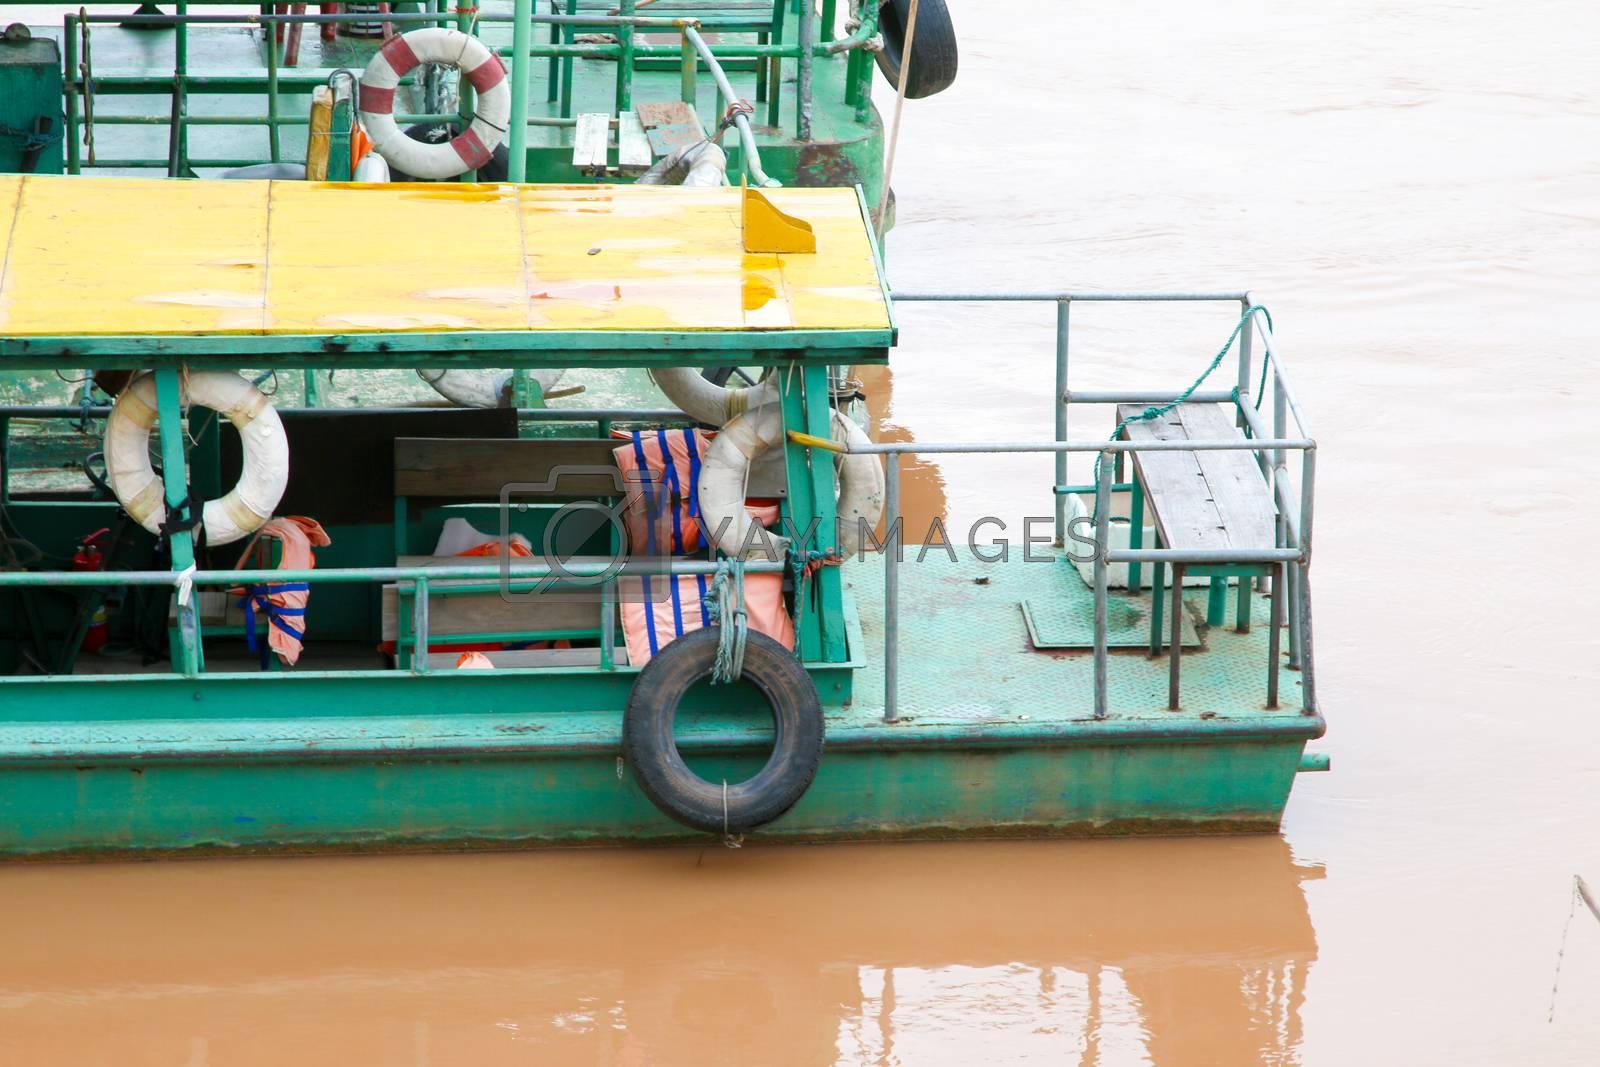 Boat across the Mekong River, Thailand - Laos.